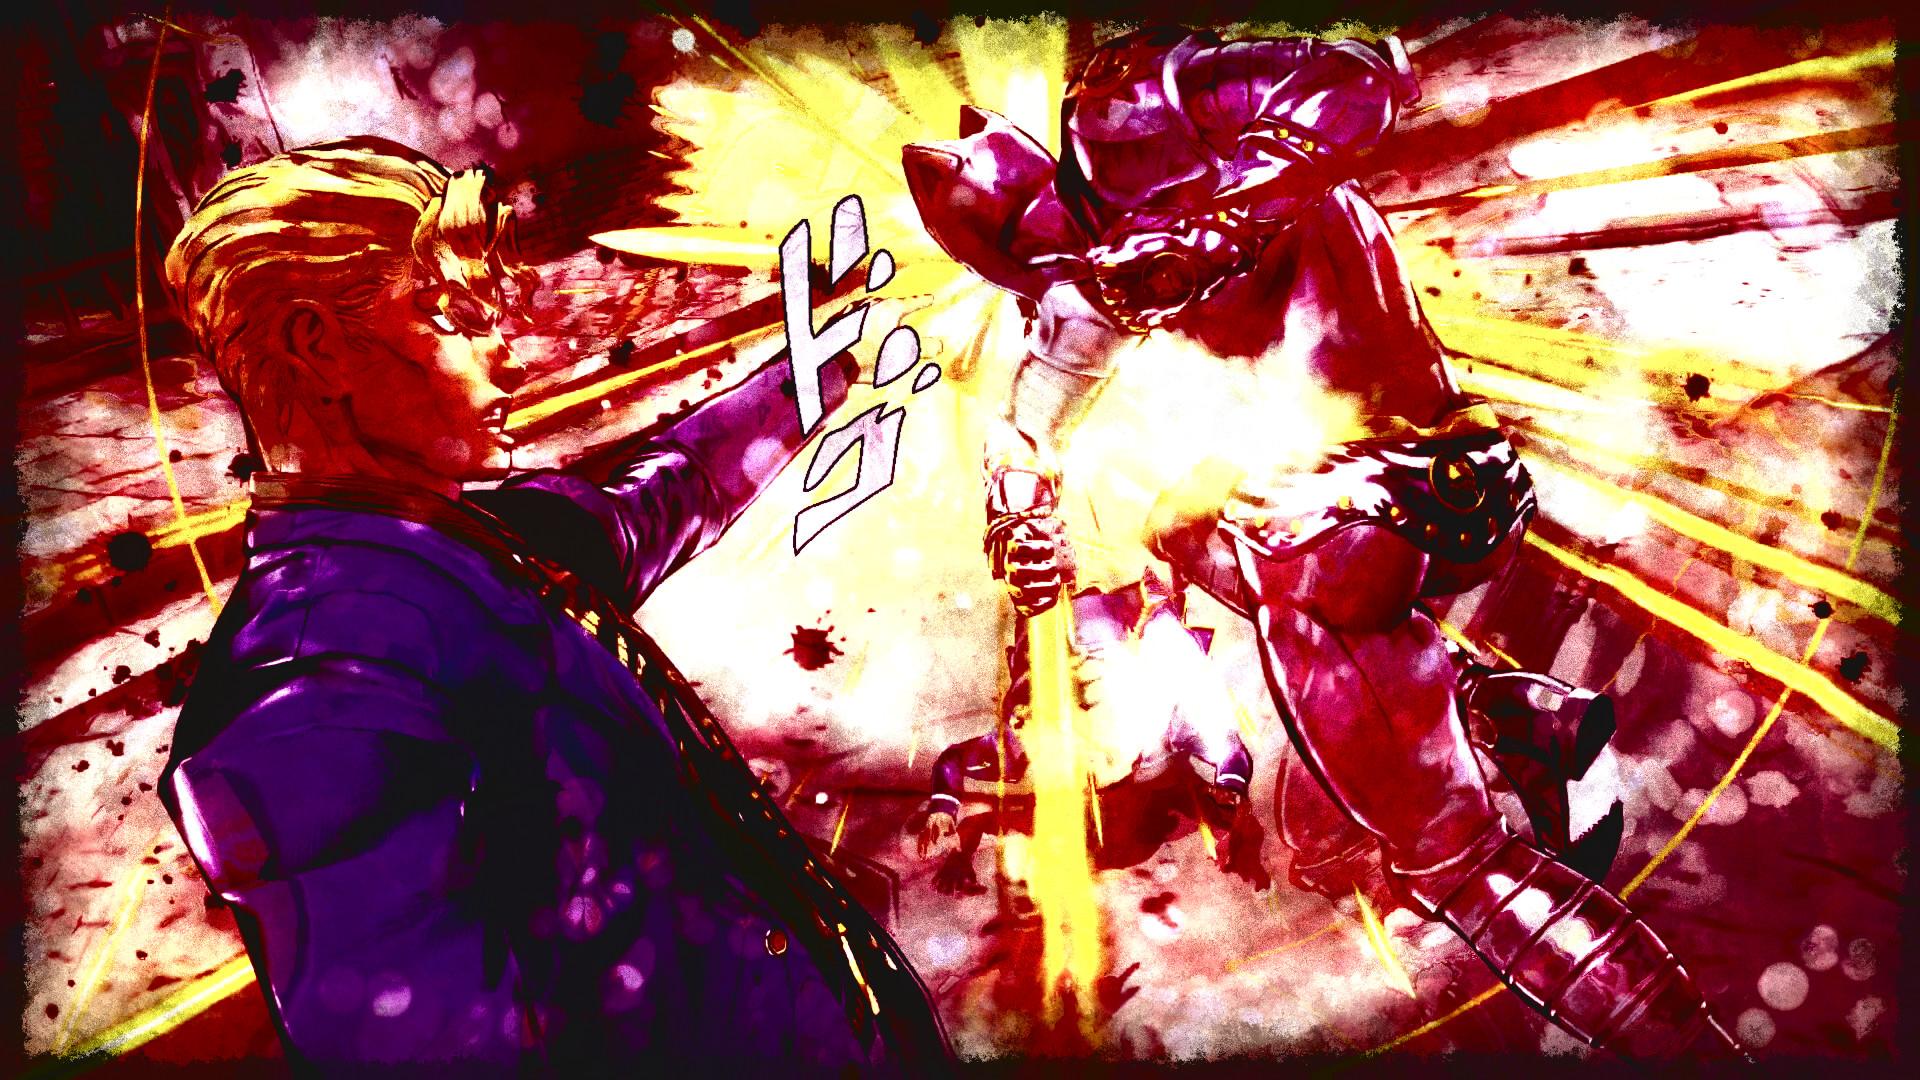 Anime – Jojo's Bizarre Adventure Yoshikage Kira Killer Queen (Jojo's  Bizarre Adventure) Koichi Hirose